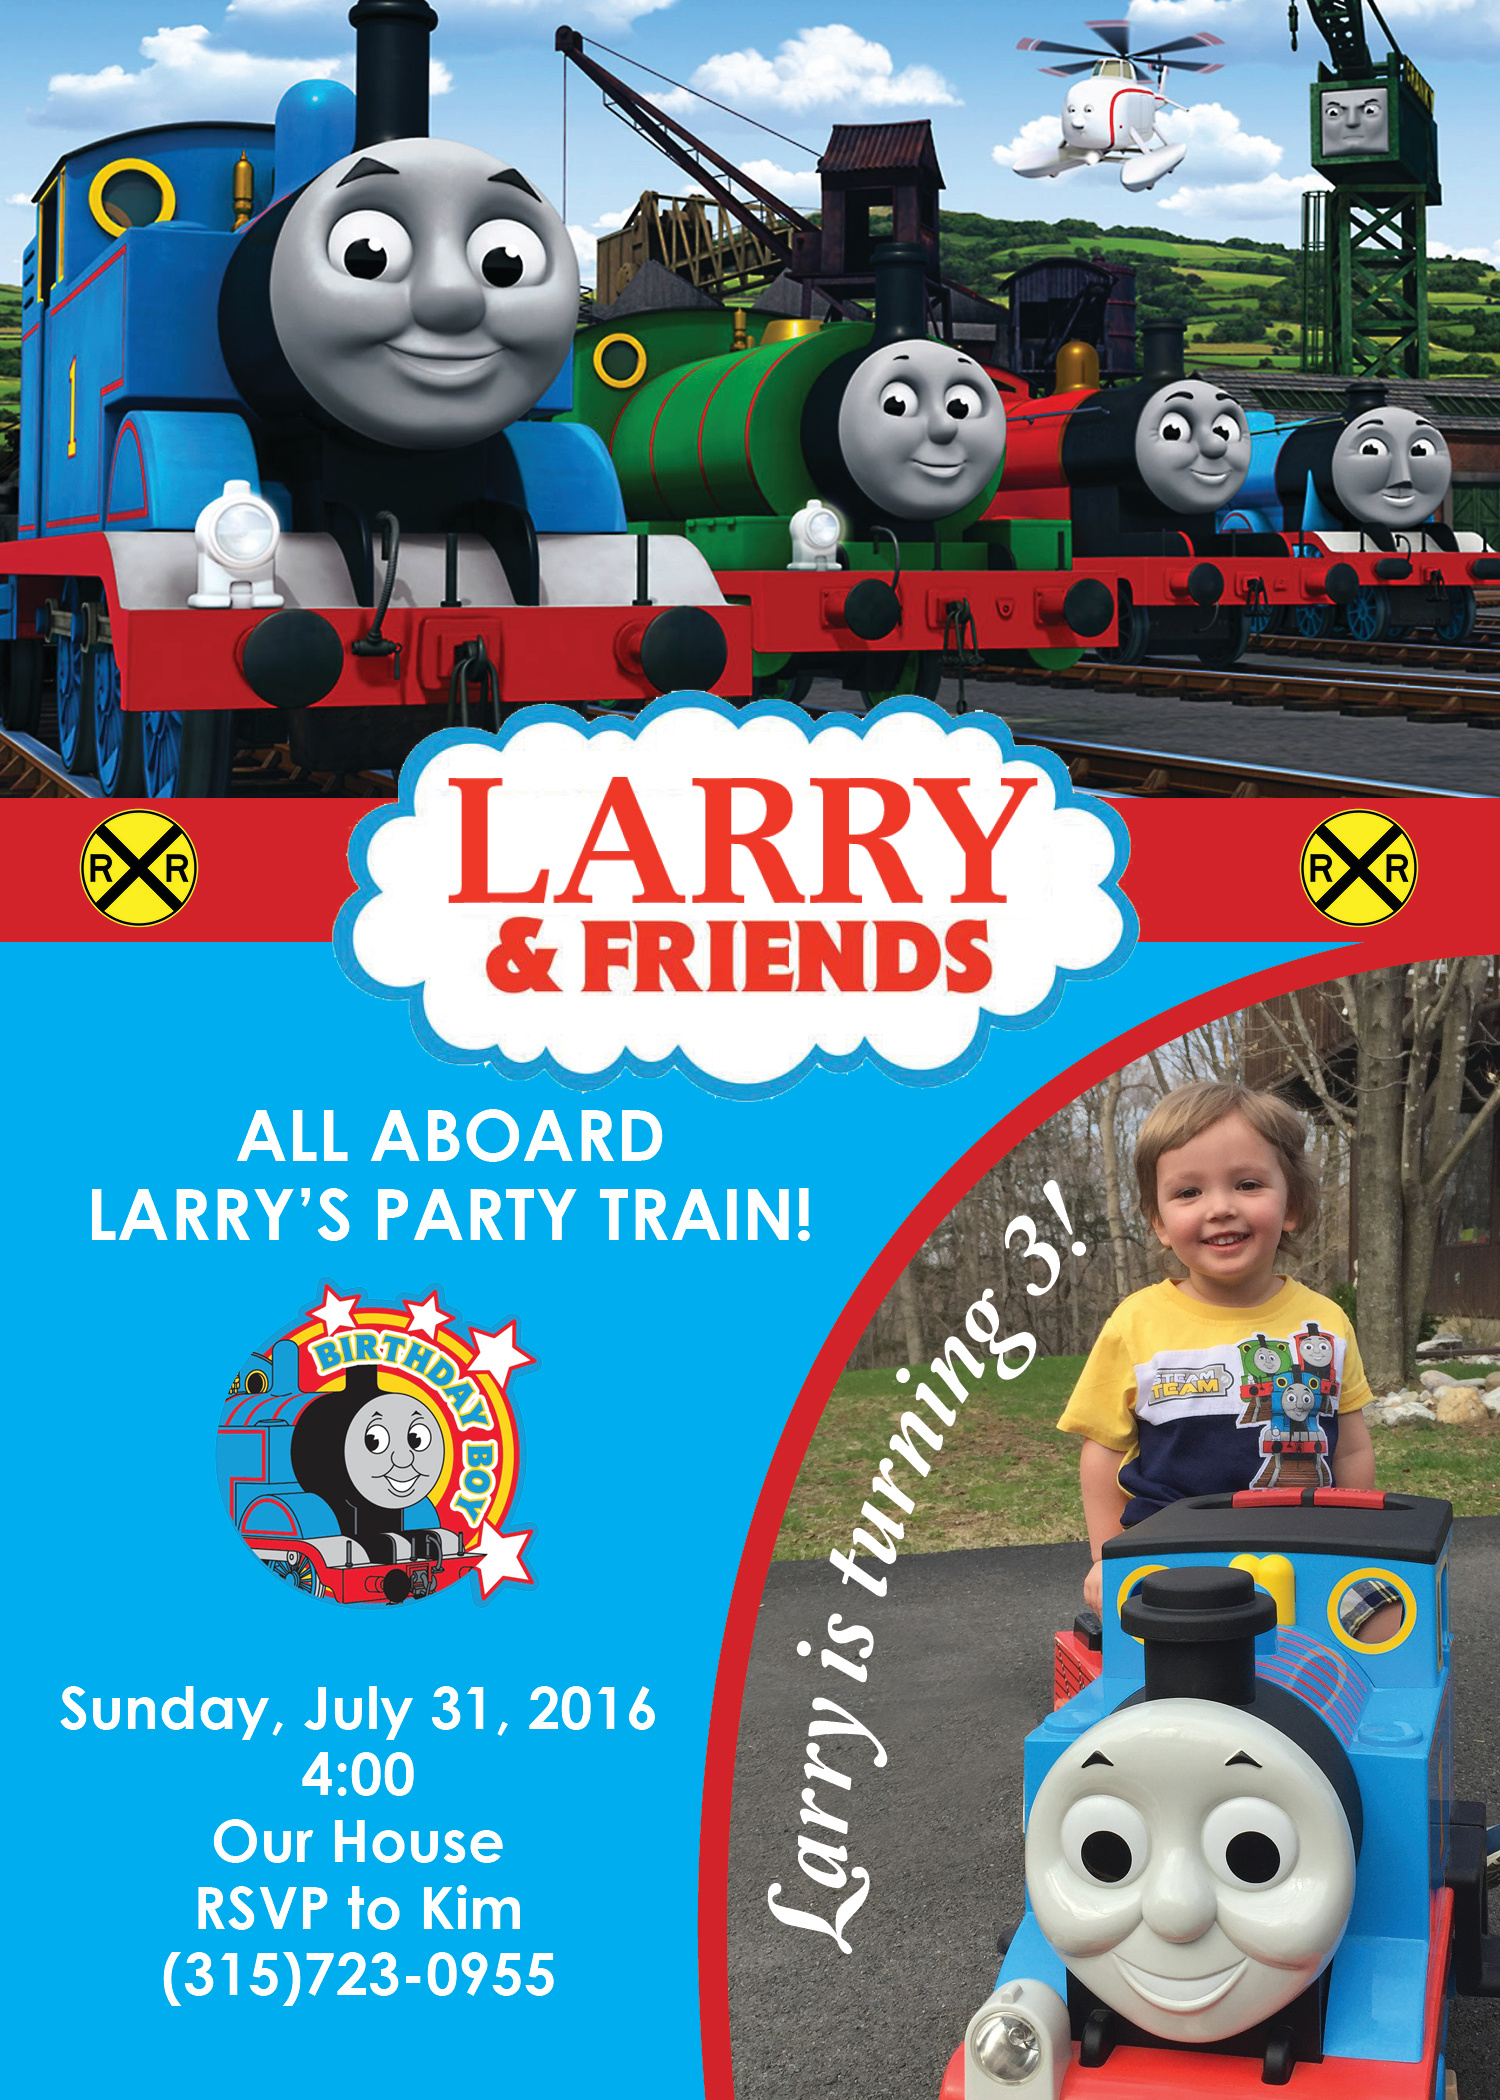 Thomas & Friends Invitation